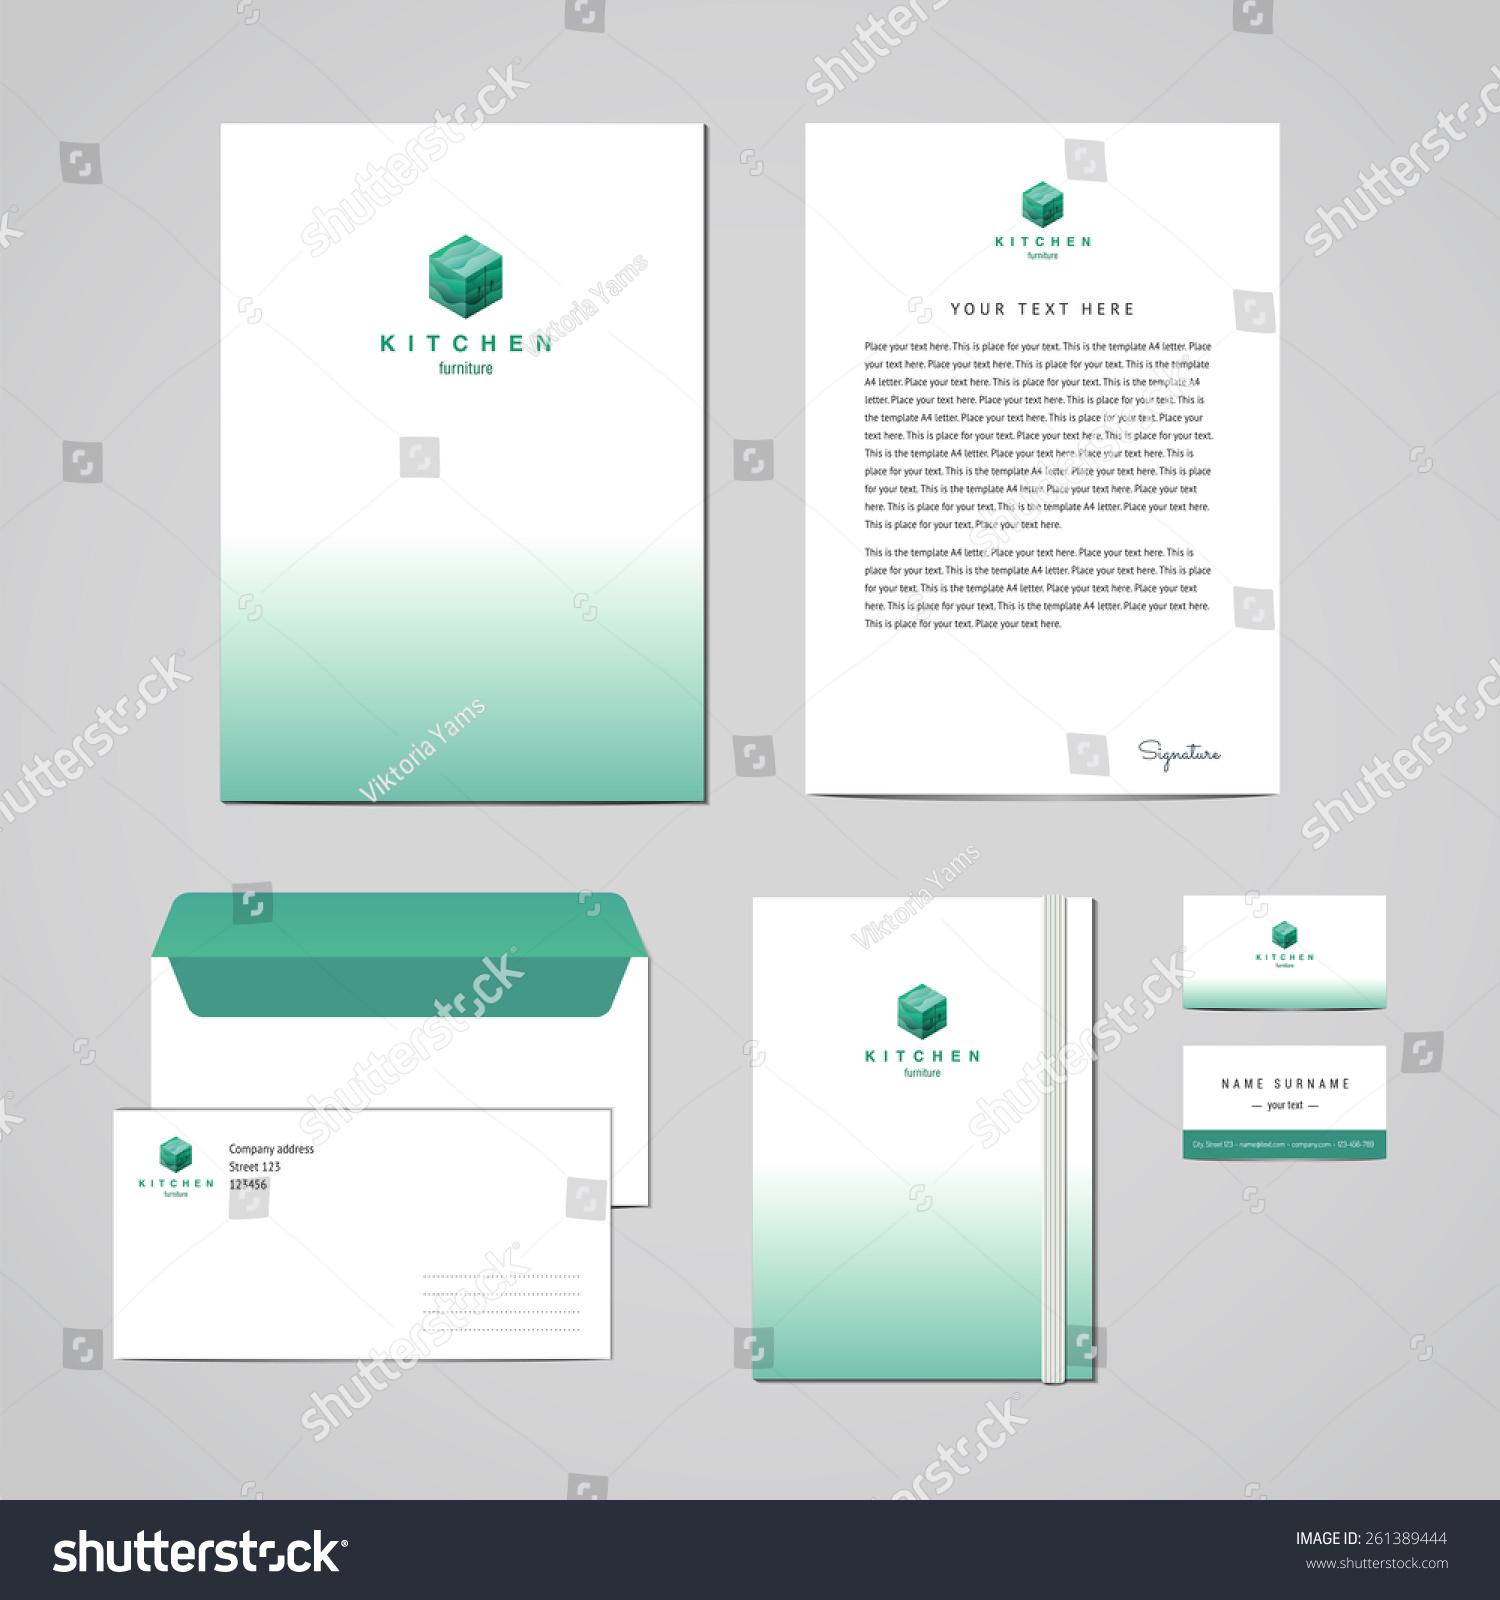 Corporate Identity Furniture Company Turquoise Design Stock Photo ...